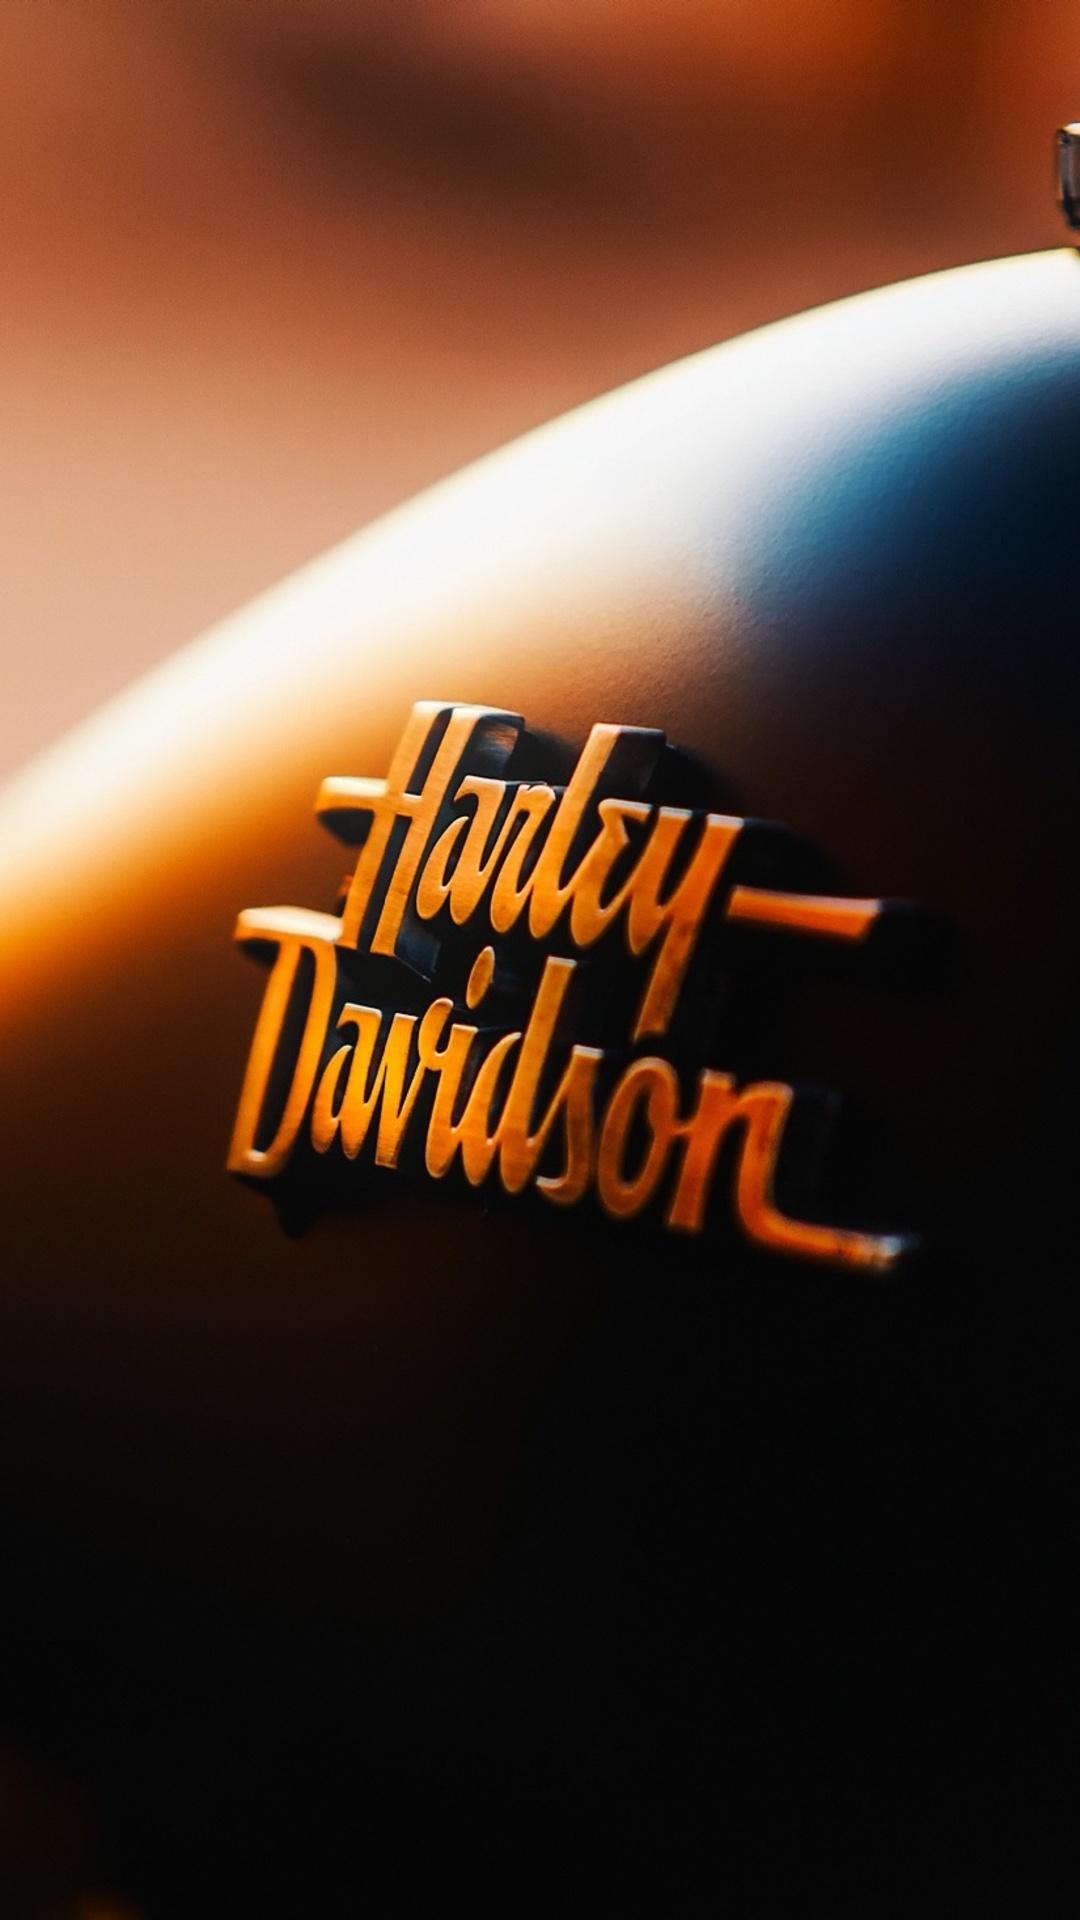 harley davidson logo wallpapers gallery wallpaper and